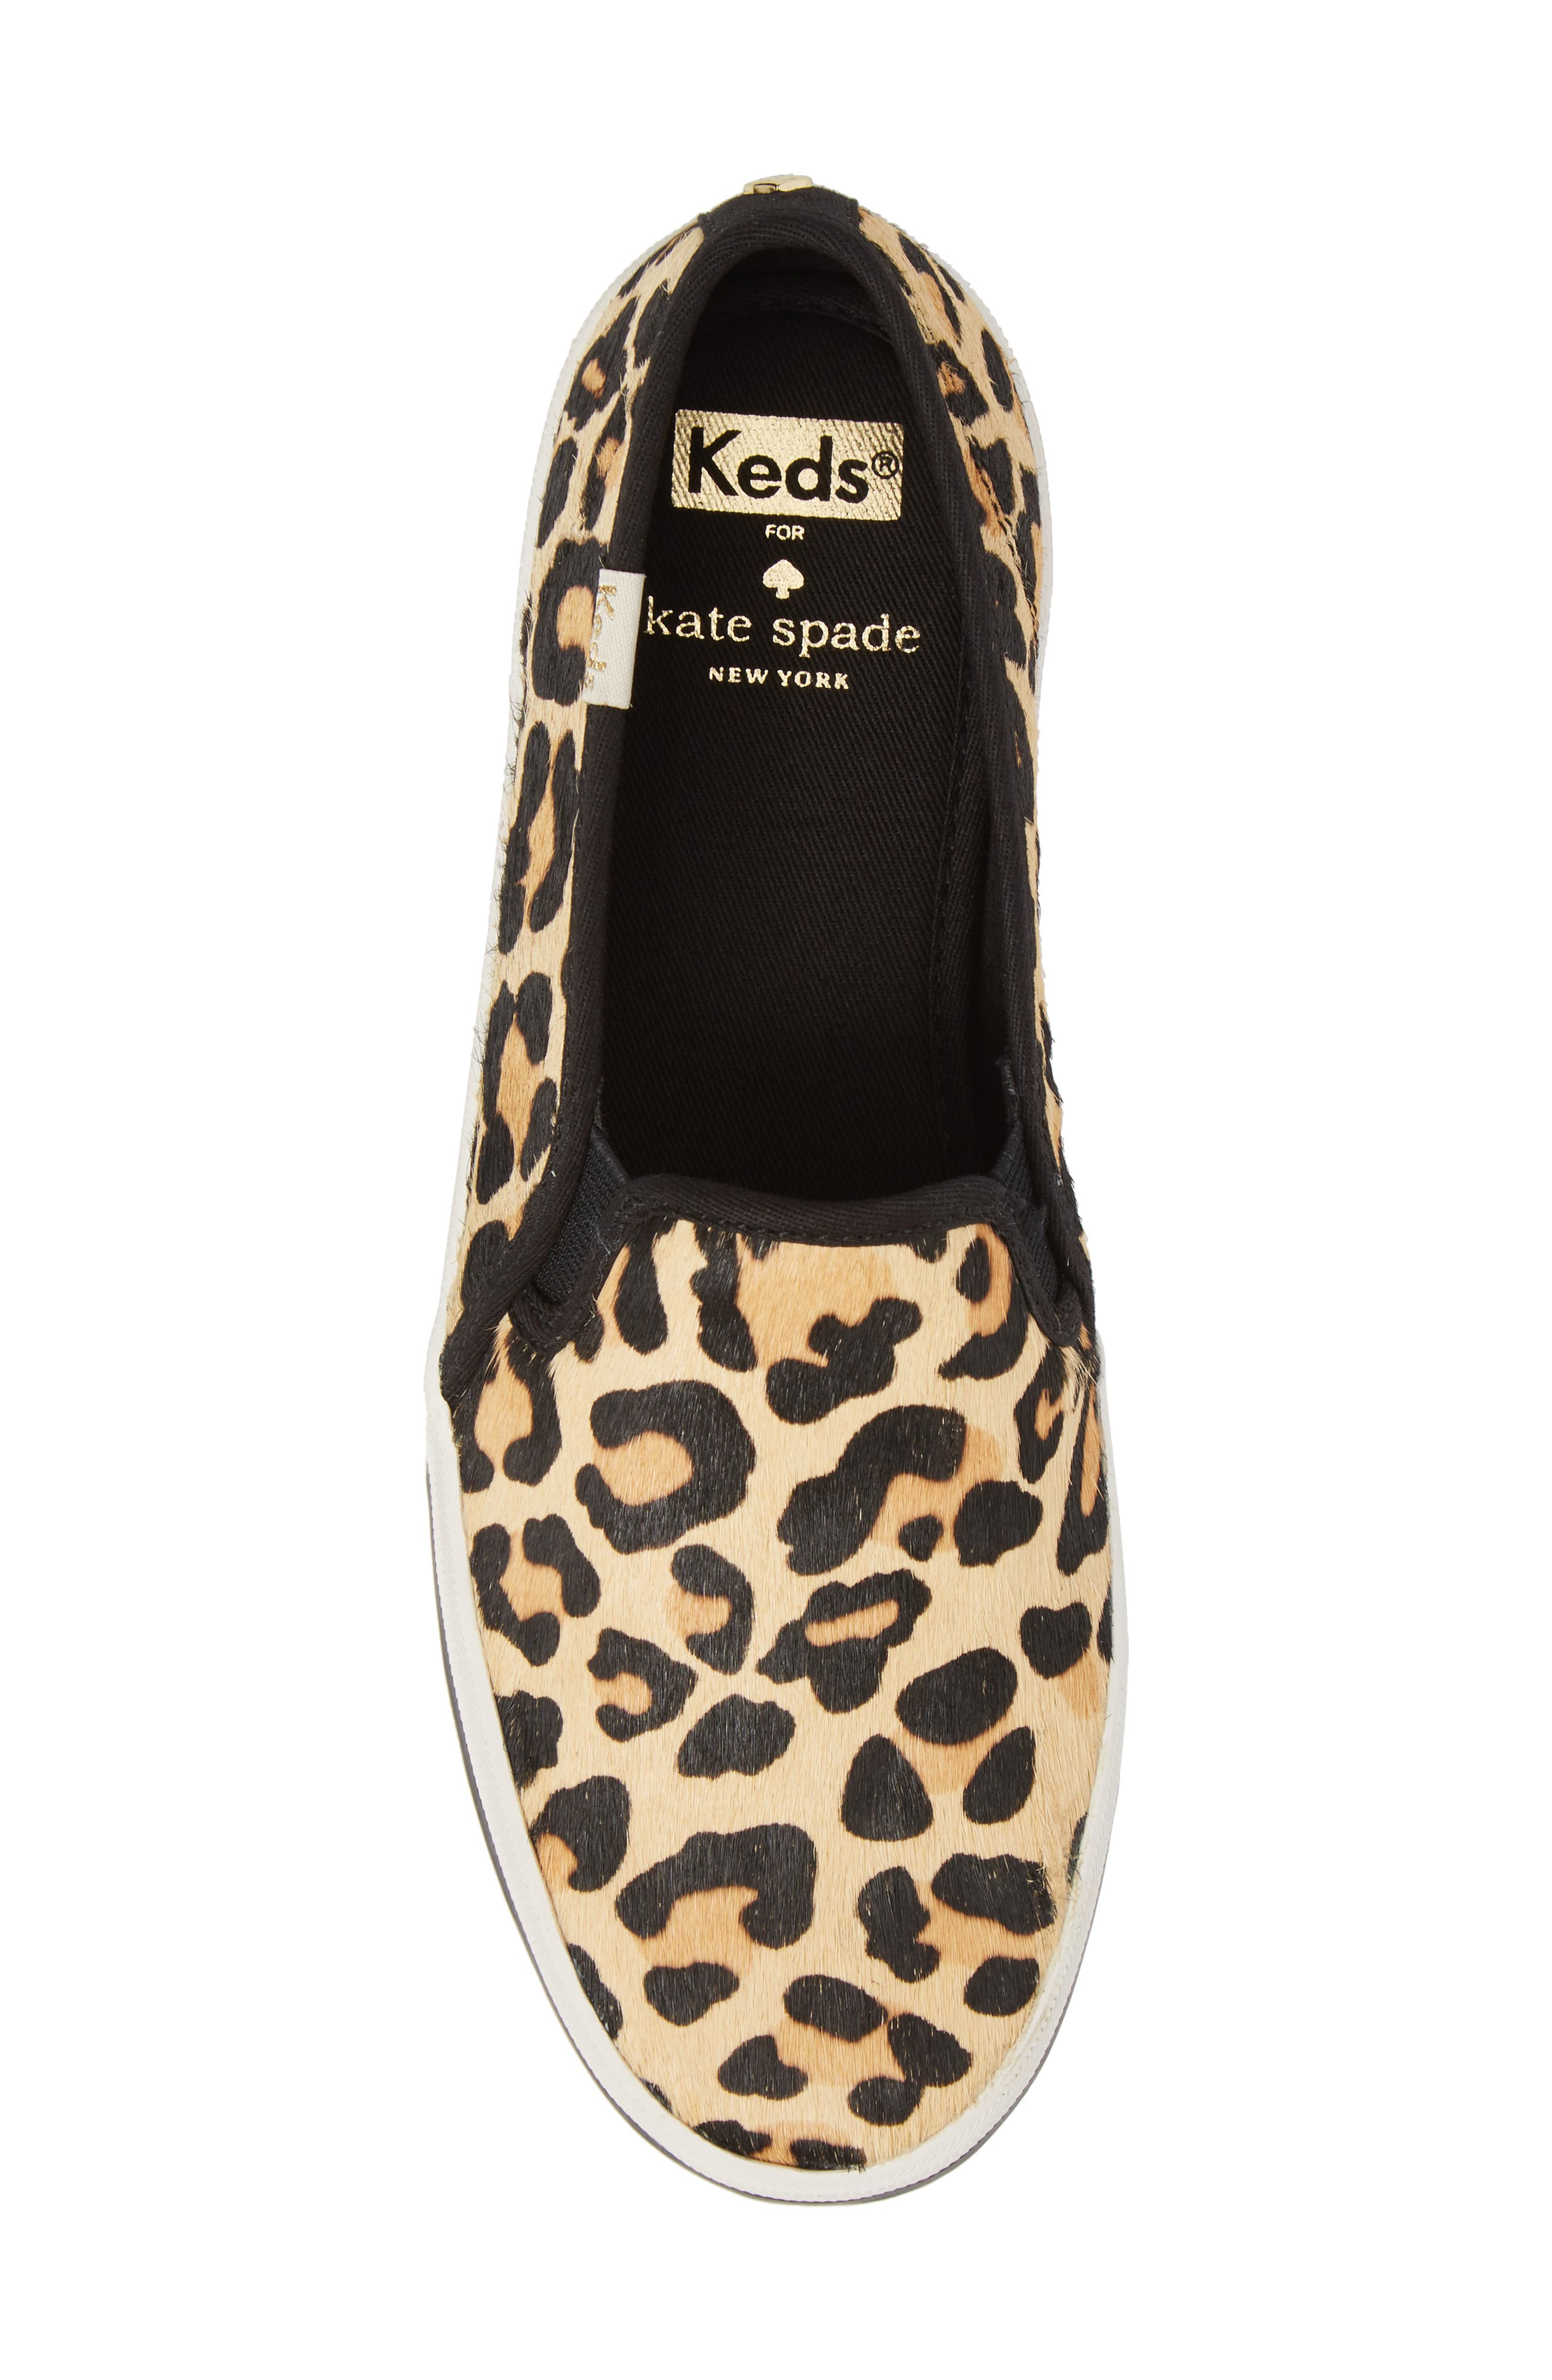 Keds<sup>®</sup> x kate spade Double Decker Slip-On Sneaker,                             Alternate thumbnail 5, color,                             Tan Pony Hair